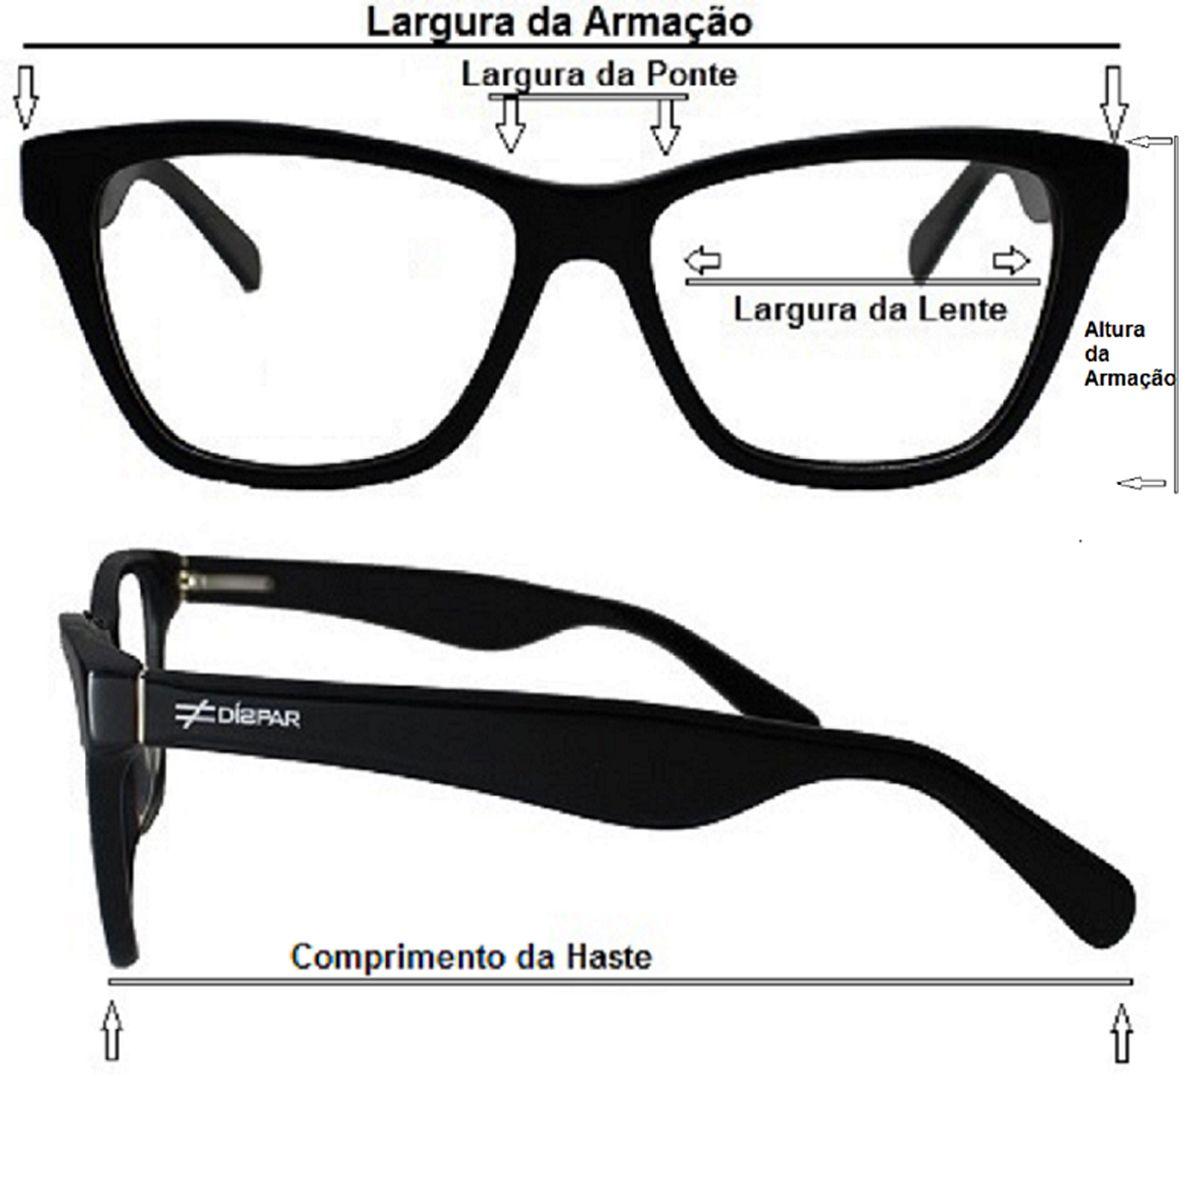 Óculos de Sol Díspar ID1798 Infantil Aviador Roxo